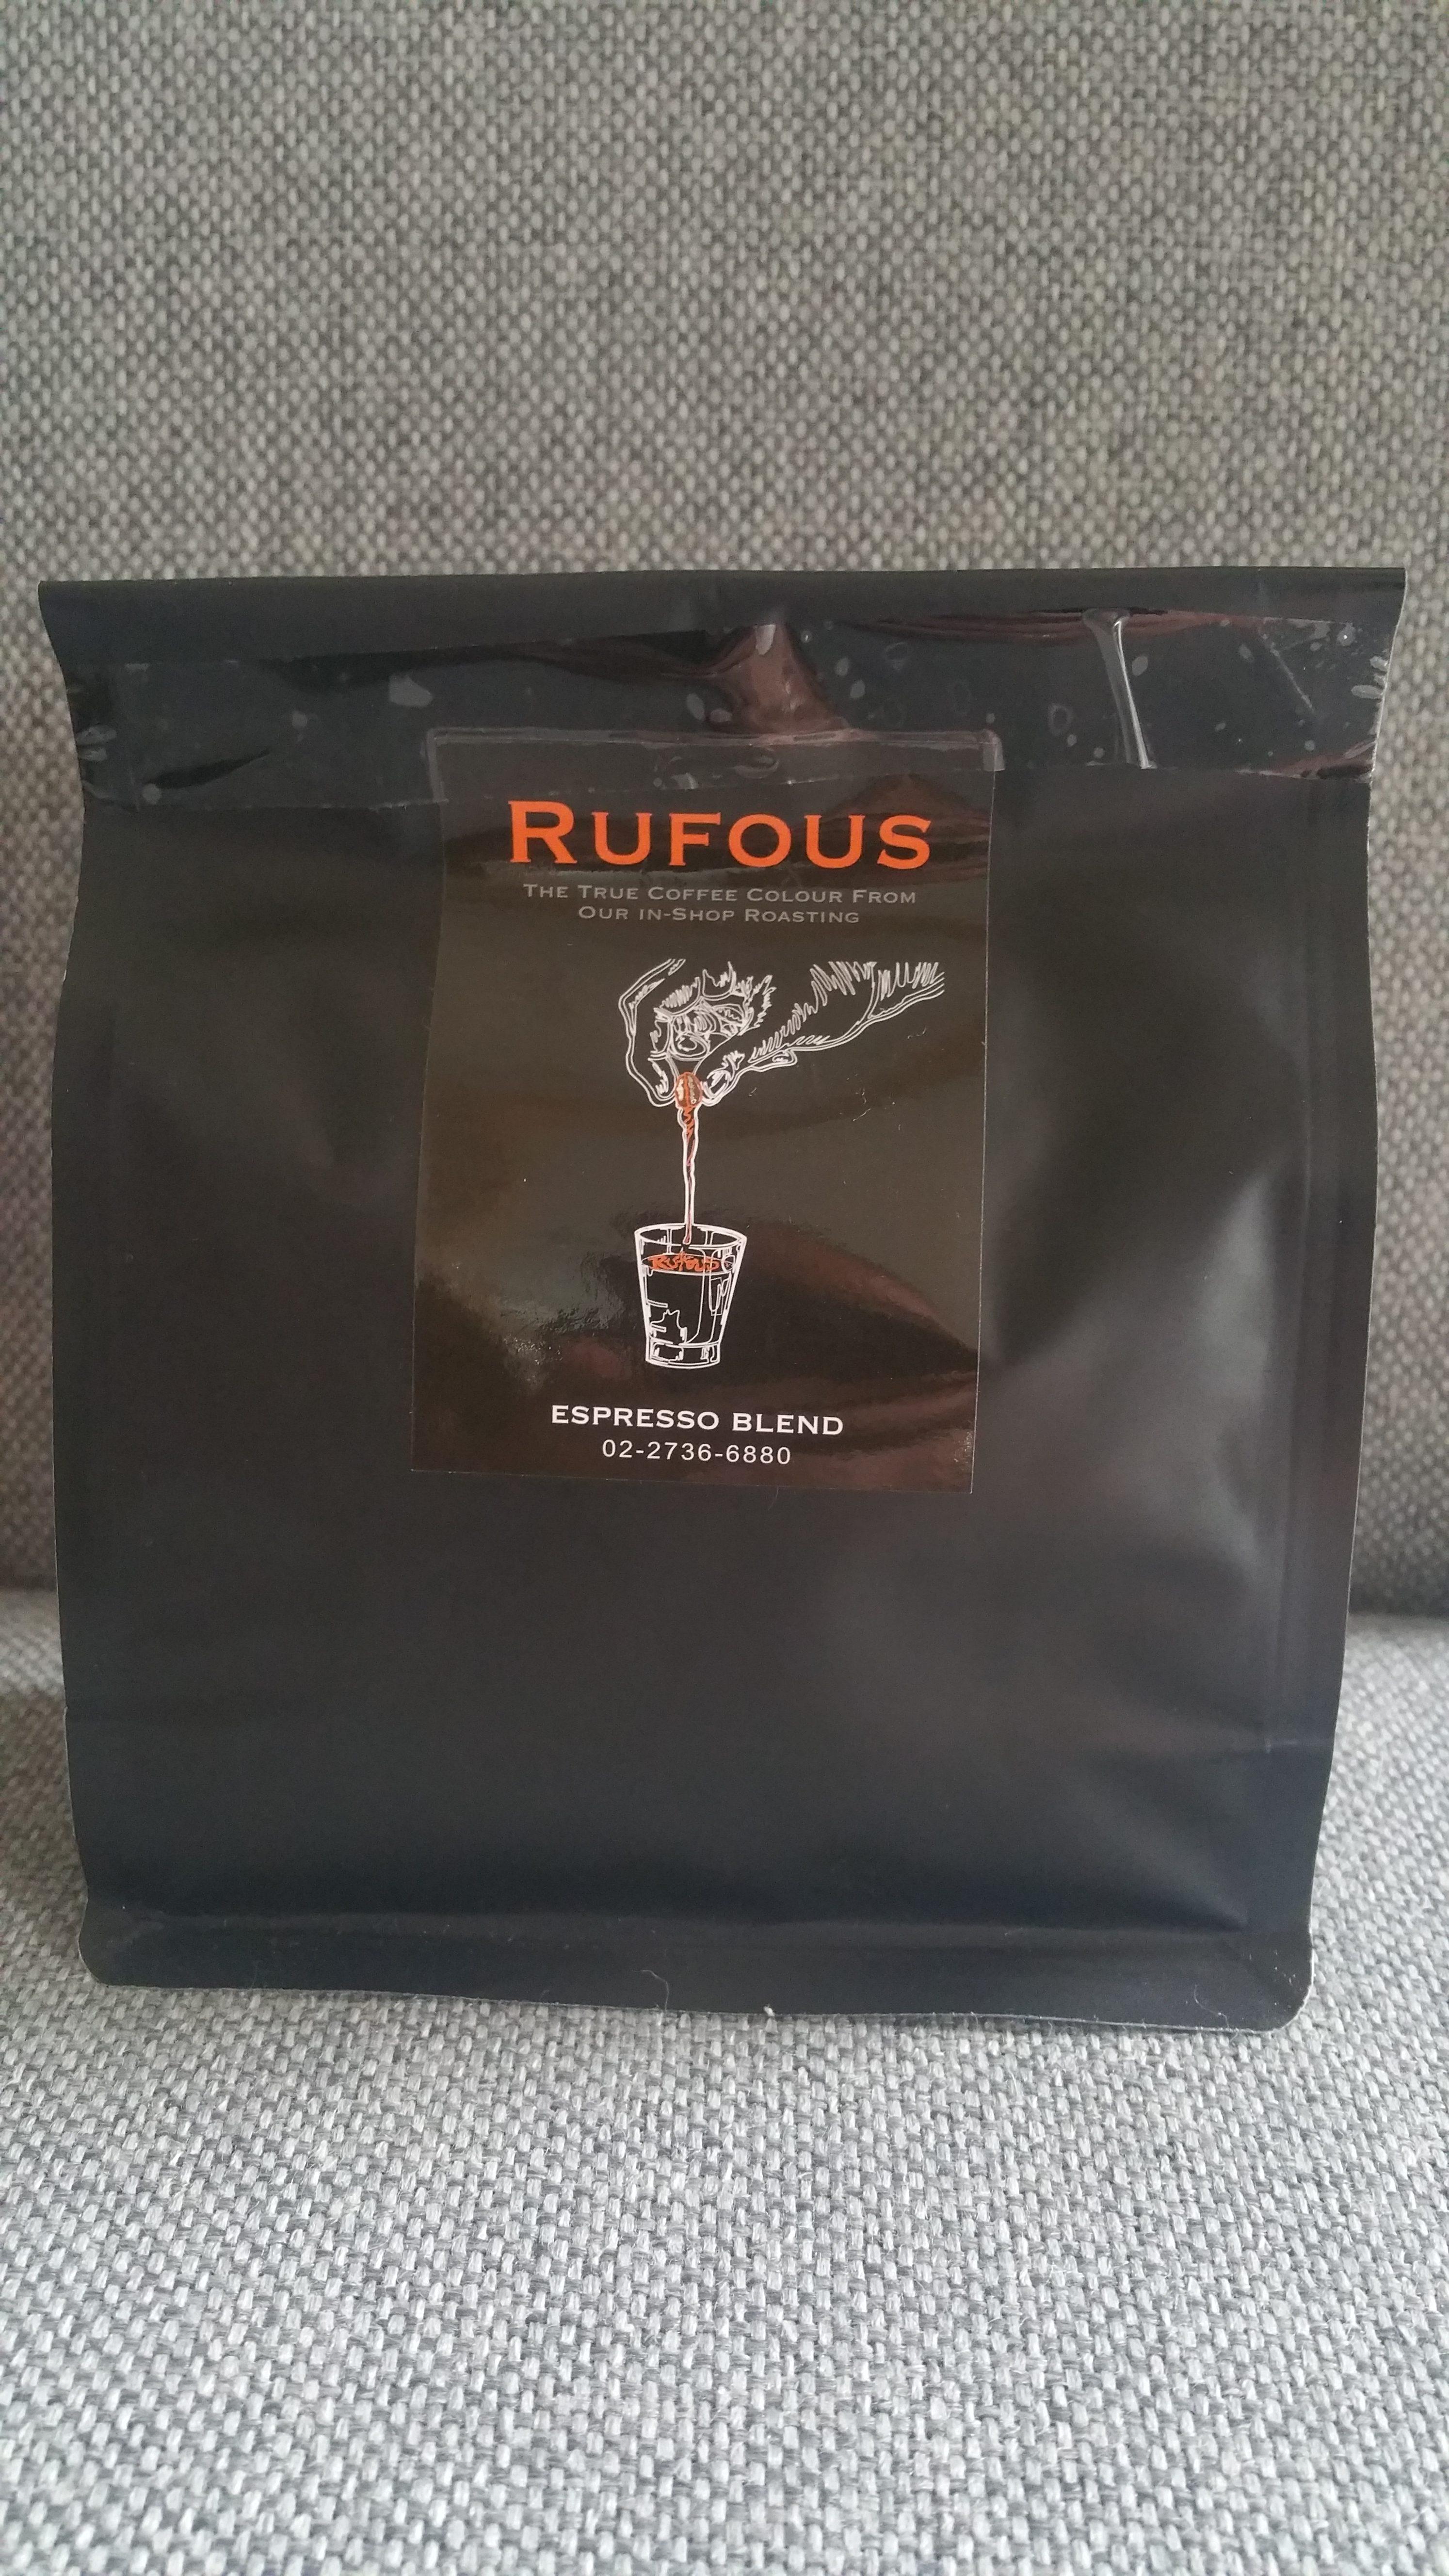 Rufous Espresso Blend 1